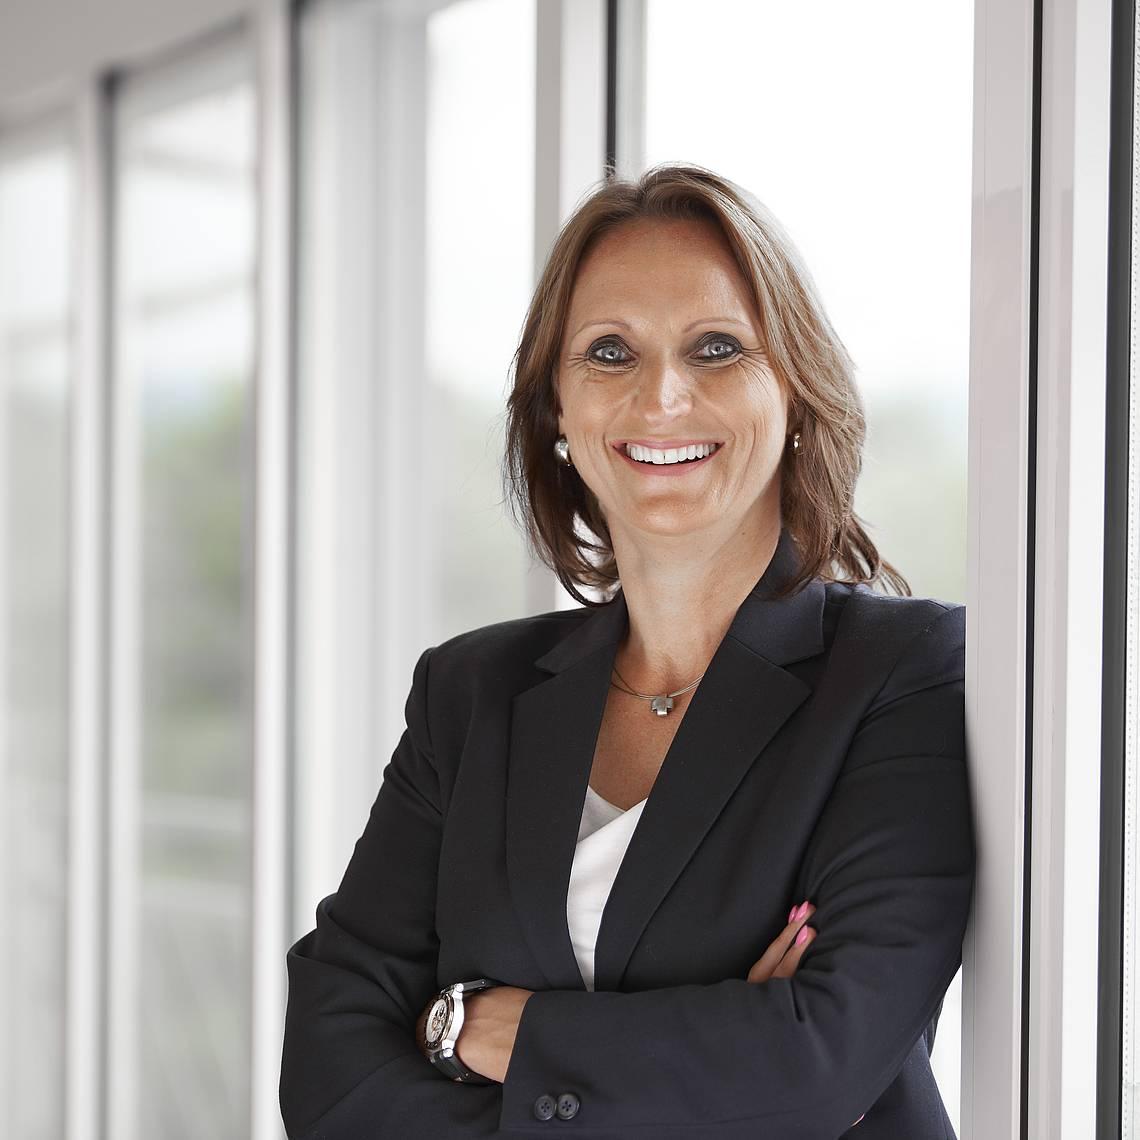 Marina Neuhaus, Geschäftsführerin Kern-Haus Köln-Bonn